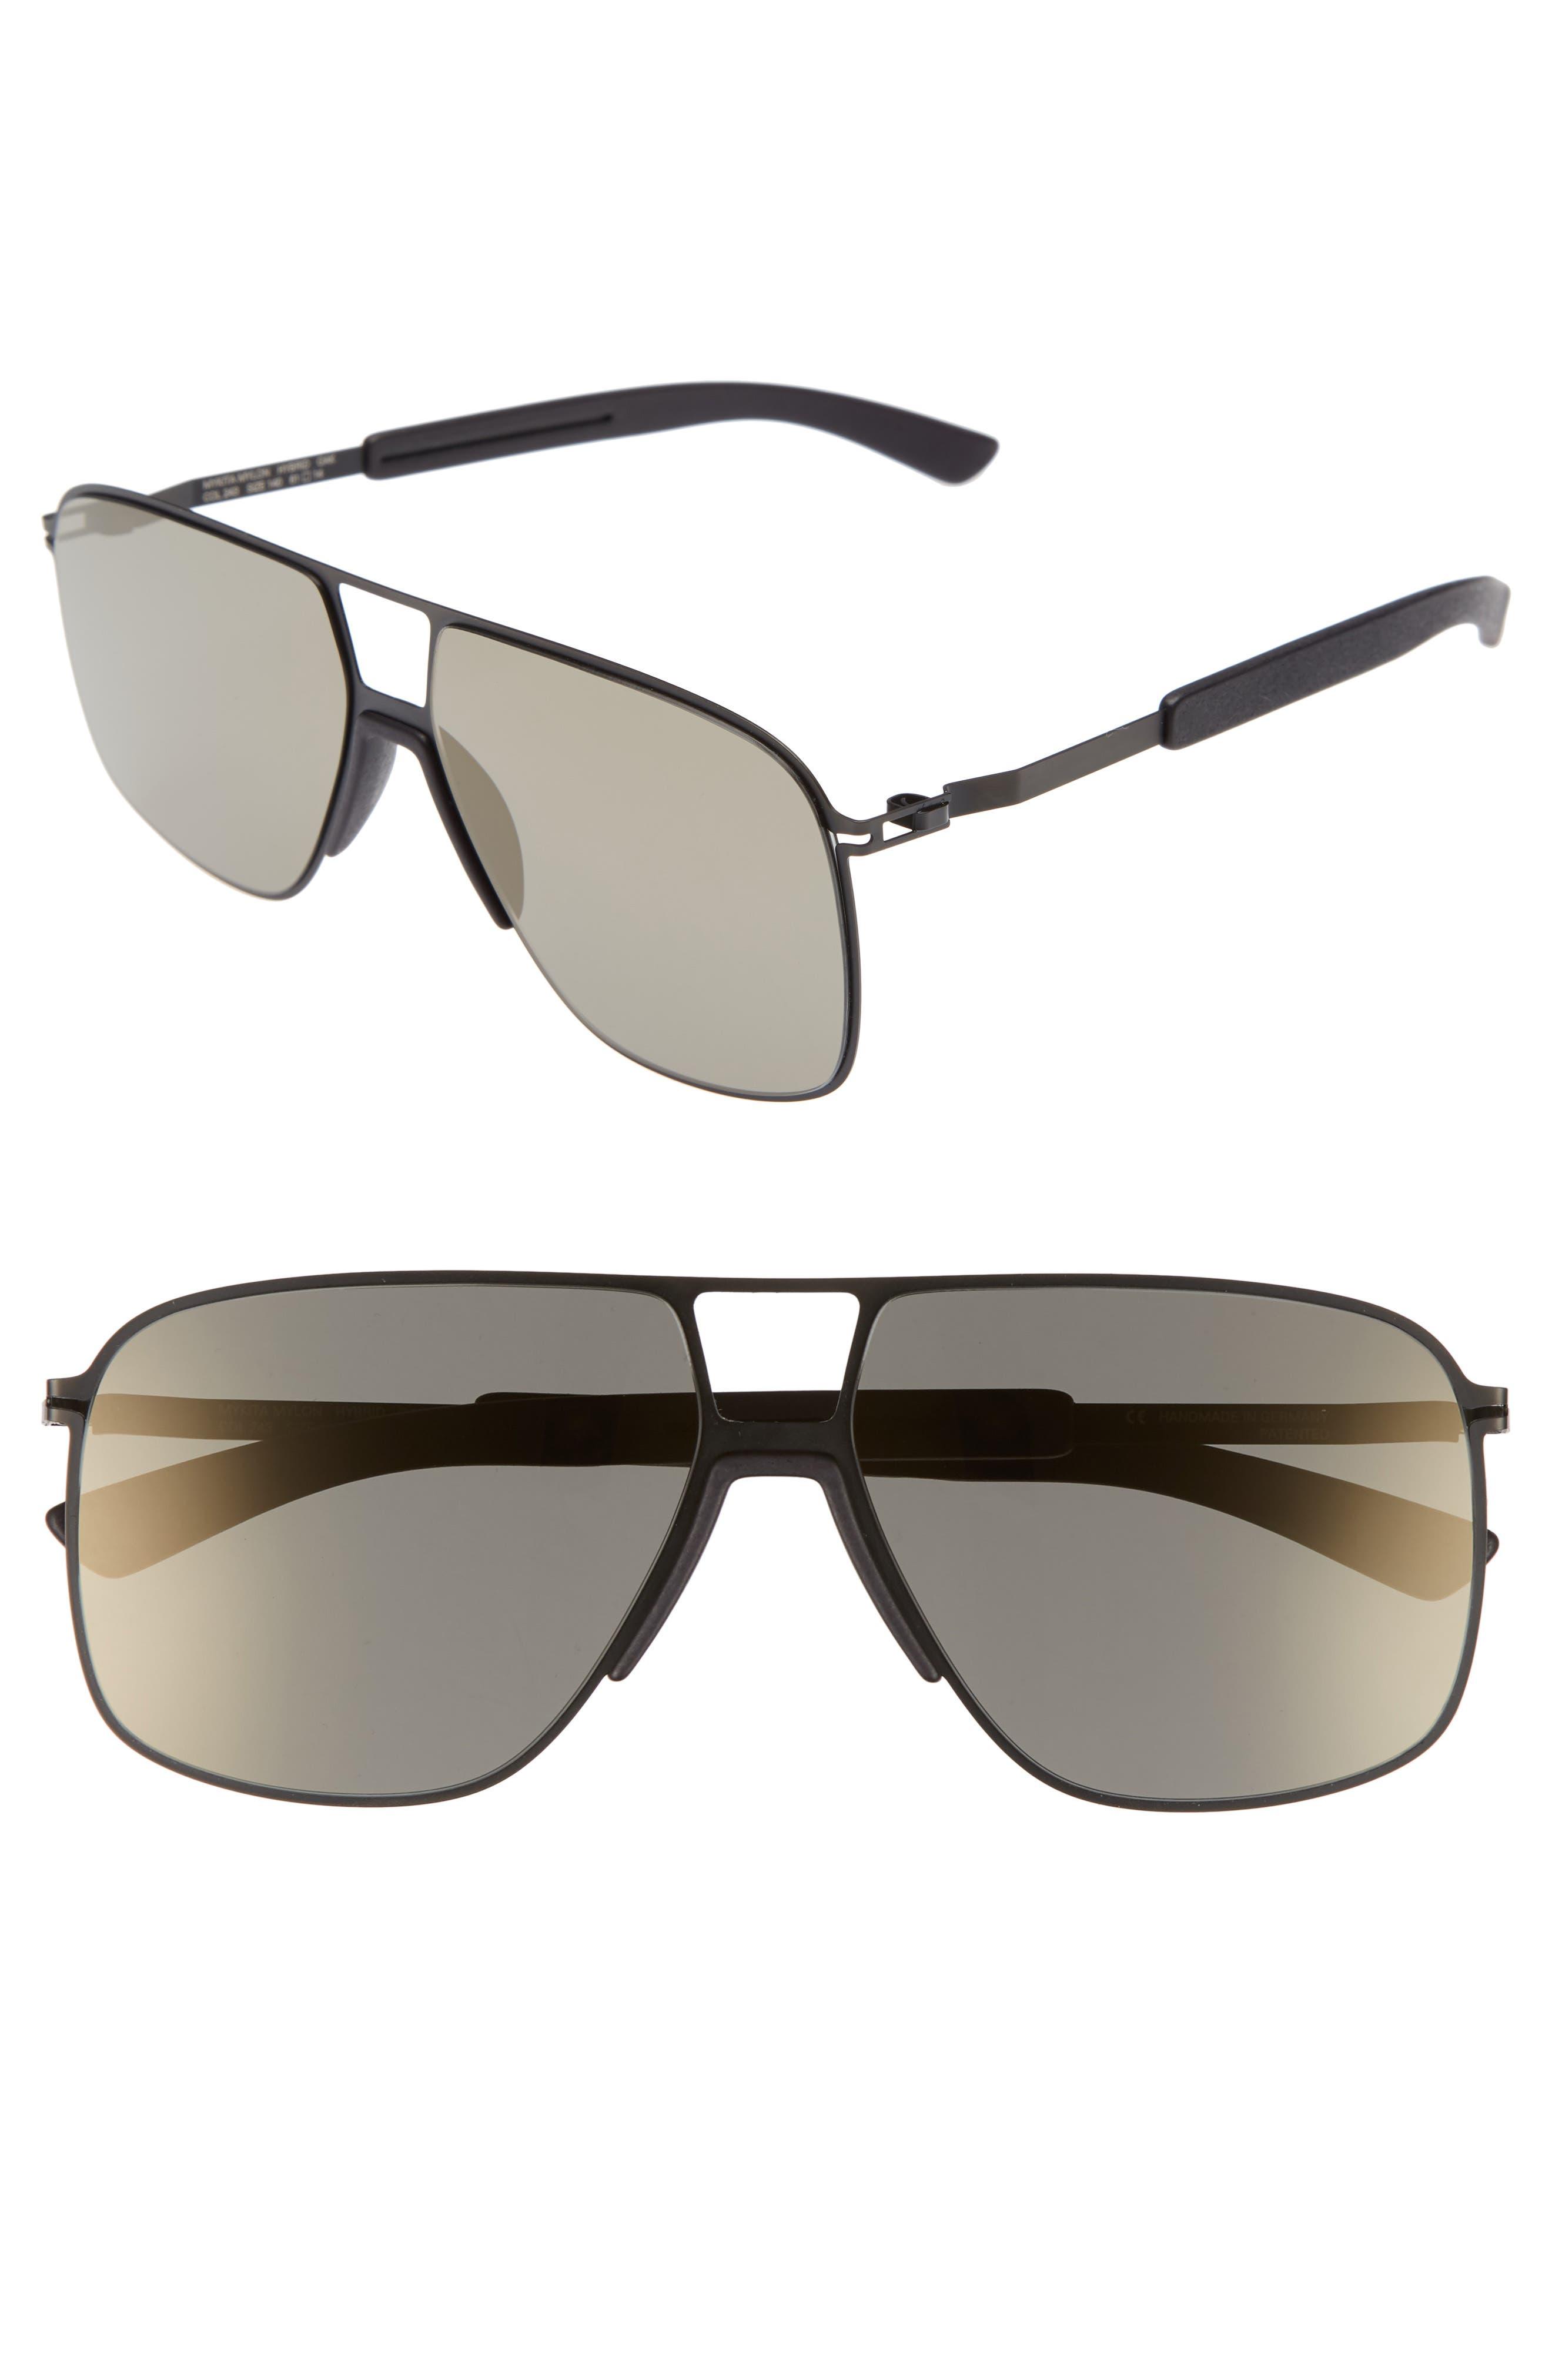 Oak 61mm Aviator Sunglasses,                         Main,                         color, 001